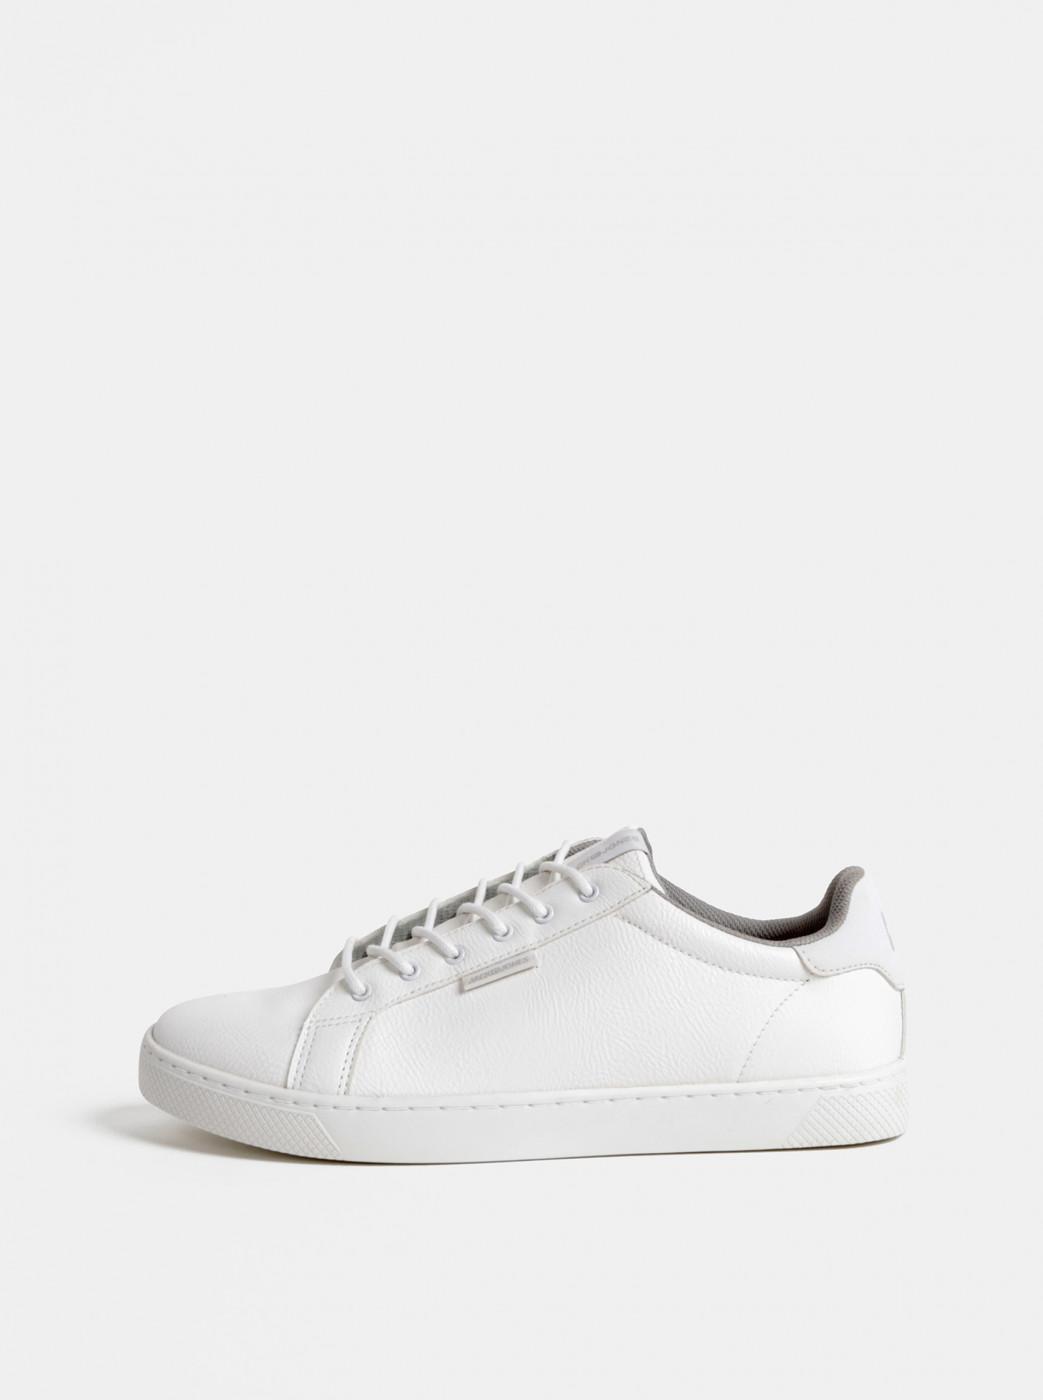 Jack & Jones Trent White Sneakers